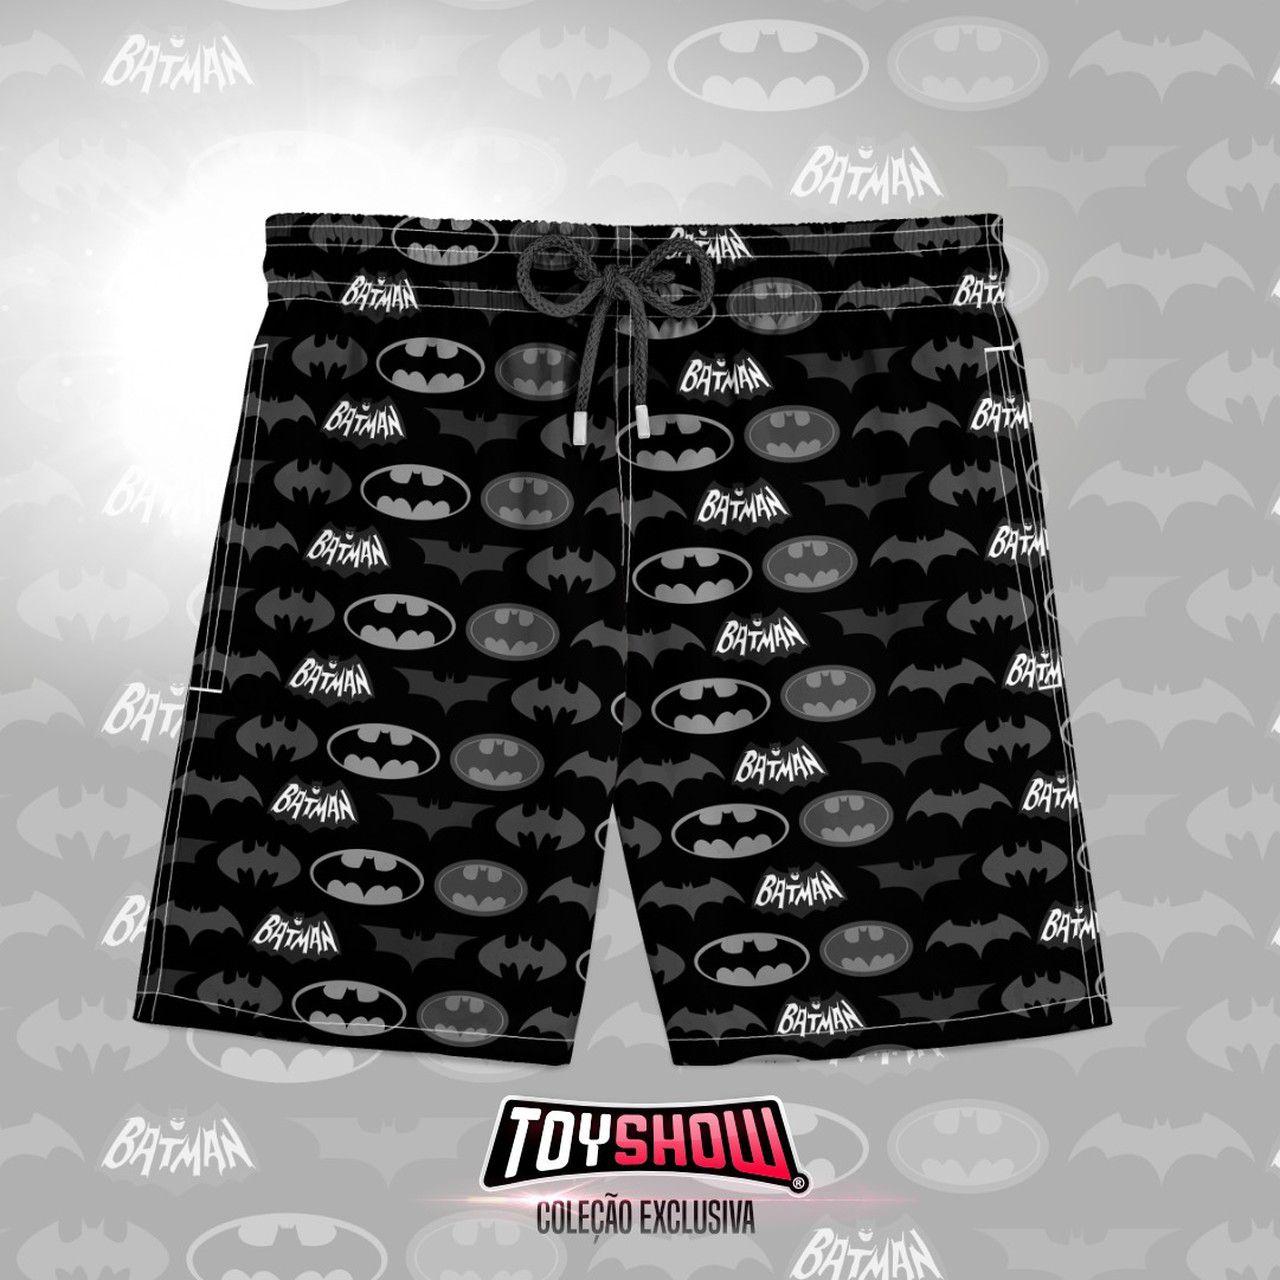 Bermuda (Shorts Praia) Logo: Batman - DC Comics